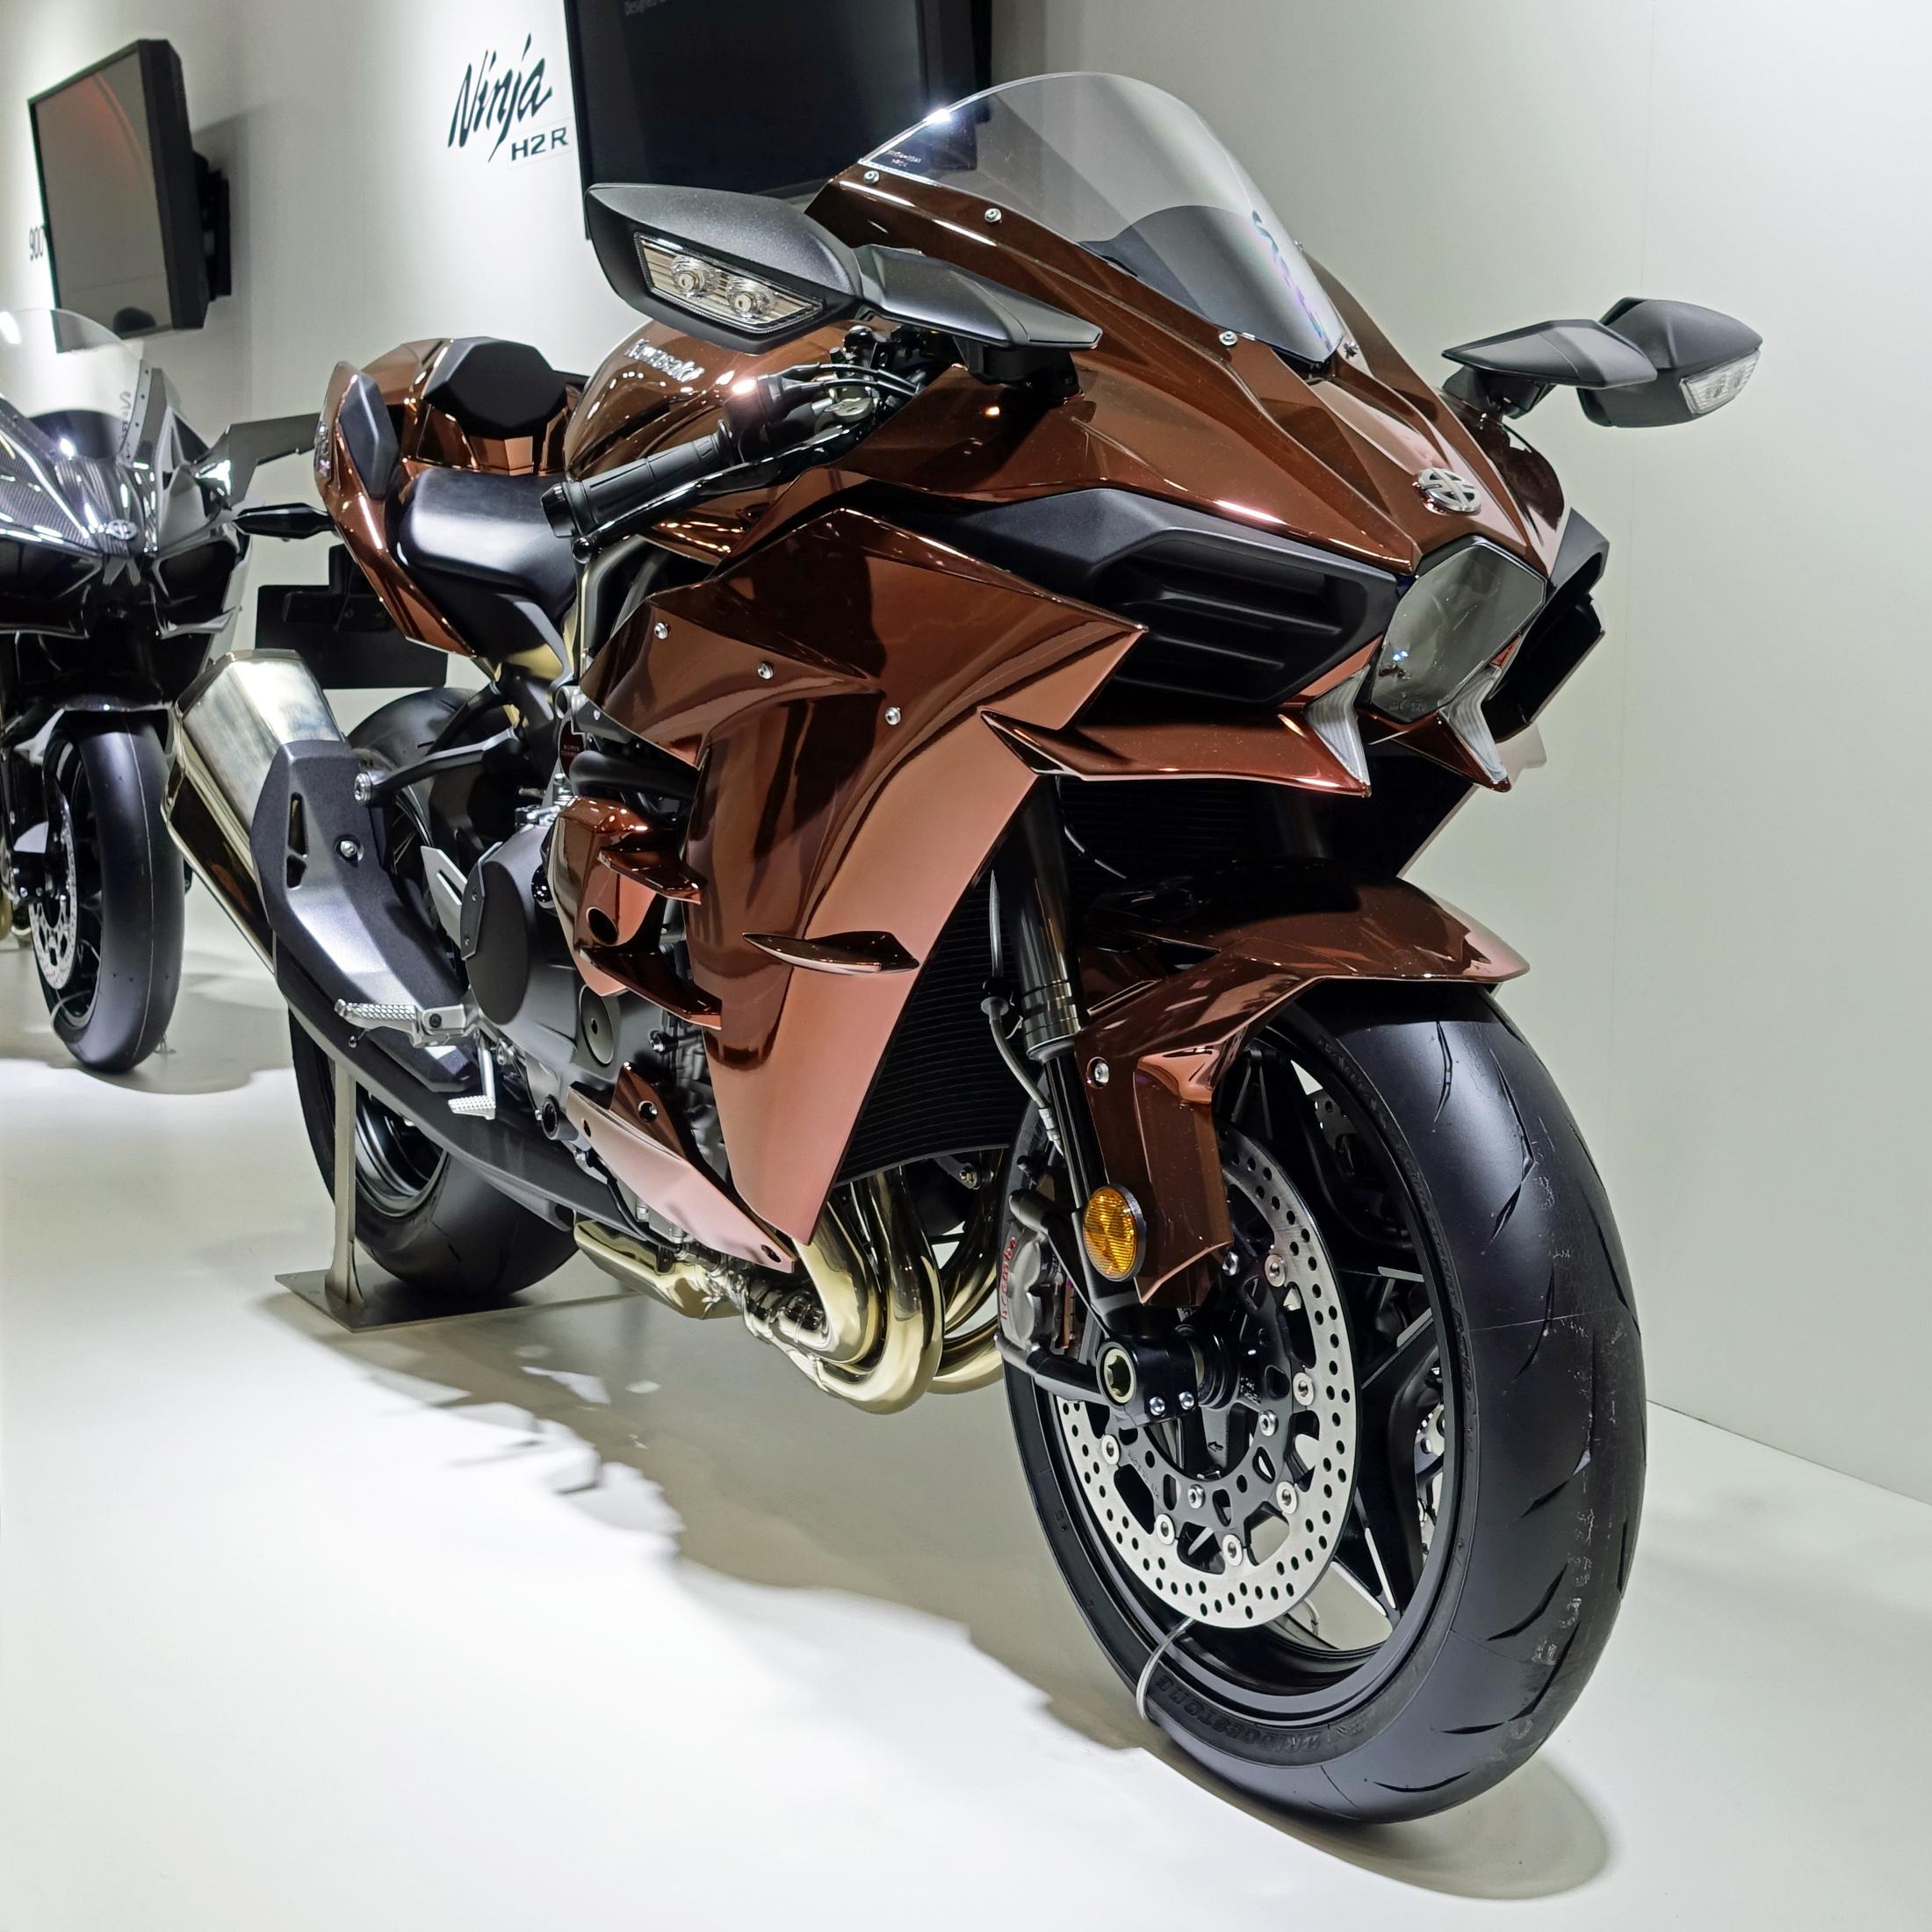 FileKawasaki Ninja H2 At The Tokyo Motor Show 2015 1